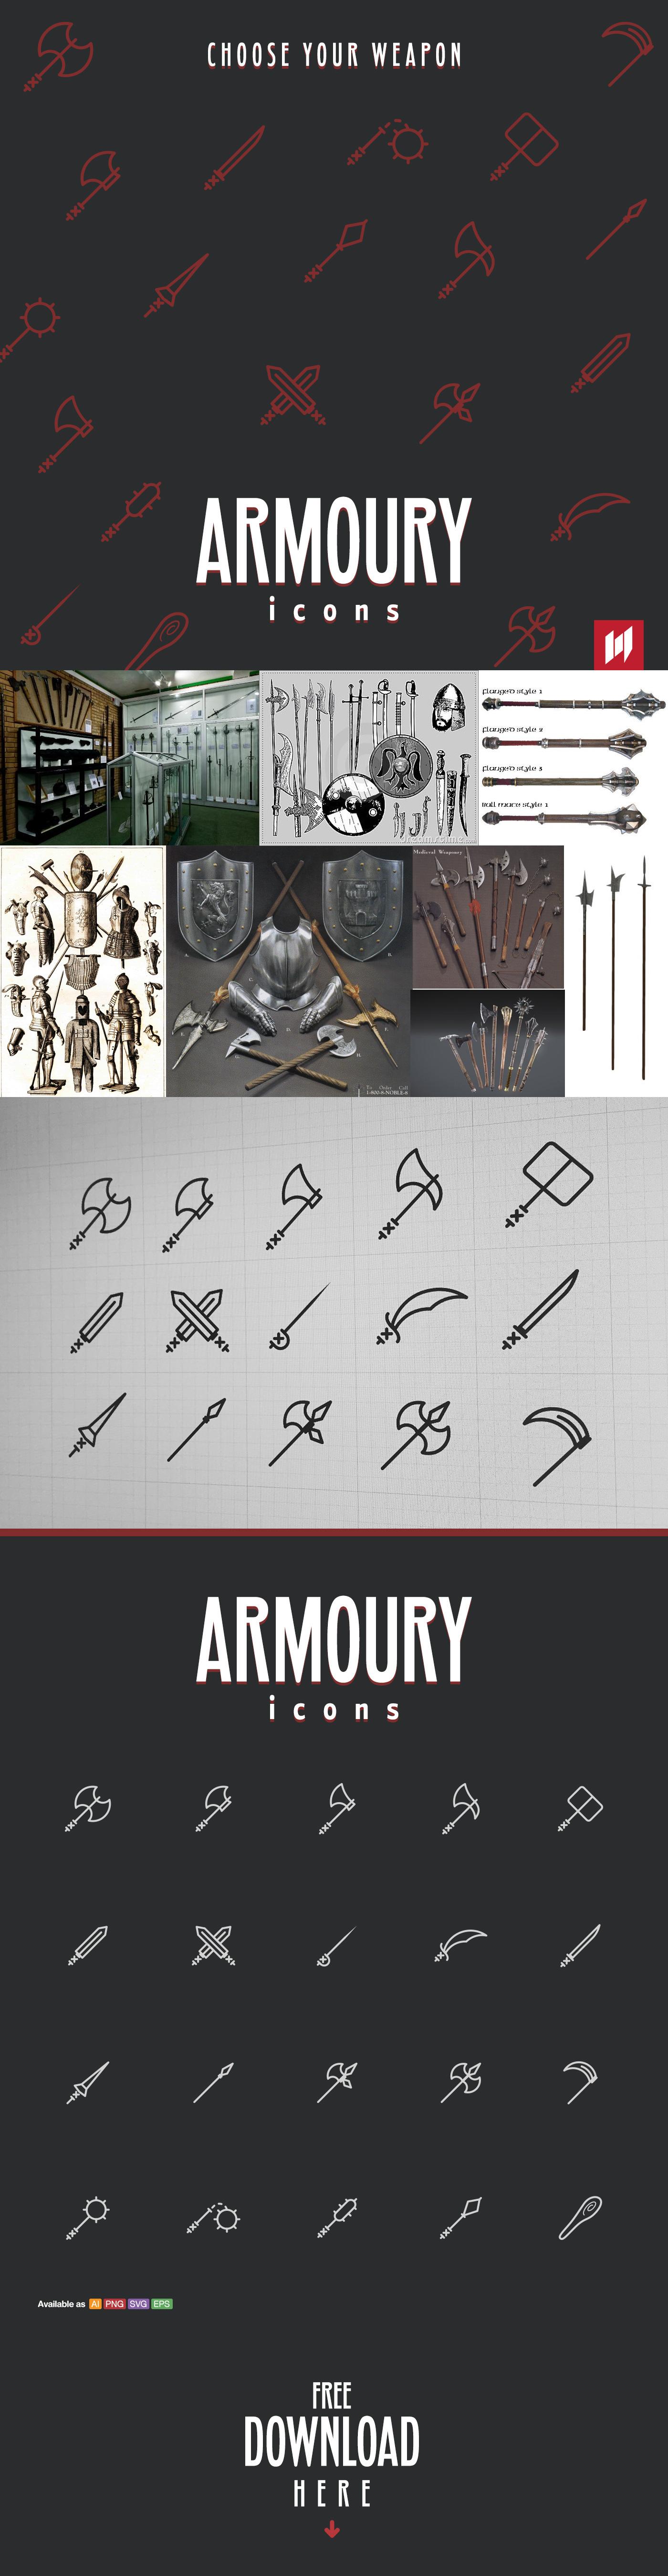 Icon free design medieval Swords Weapon armoury Armor vector UI set